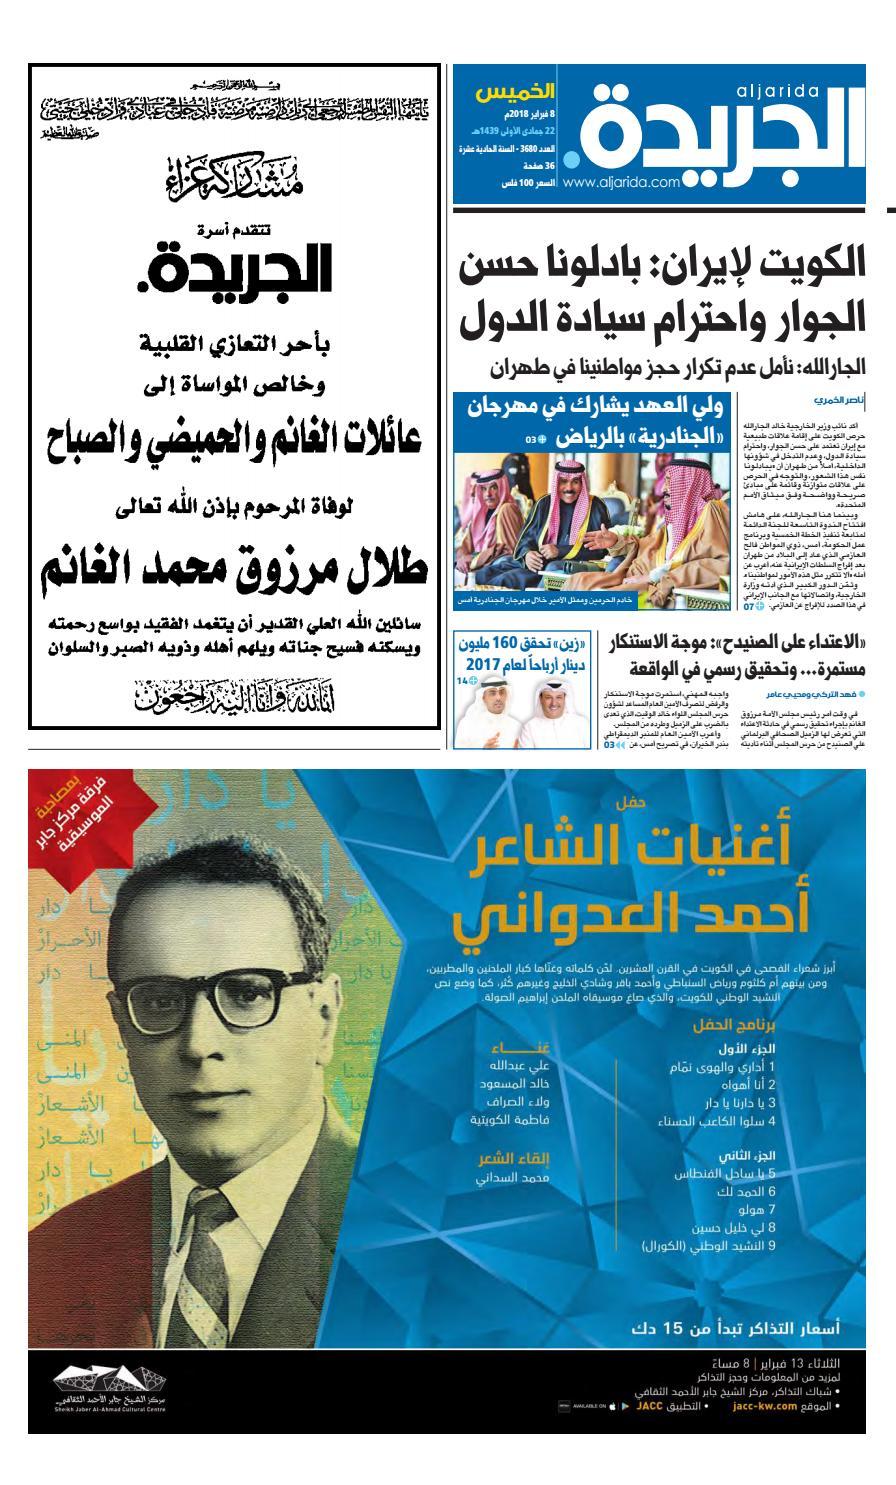 bd38f7762 عدد الجريدة الخميس 8 فبراير 2018 by Aljarida Newspaper - issuu